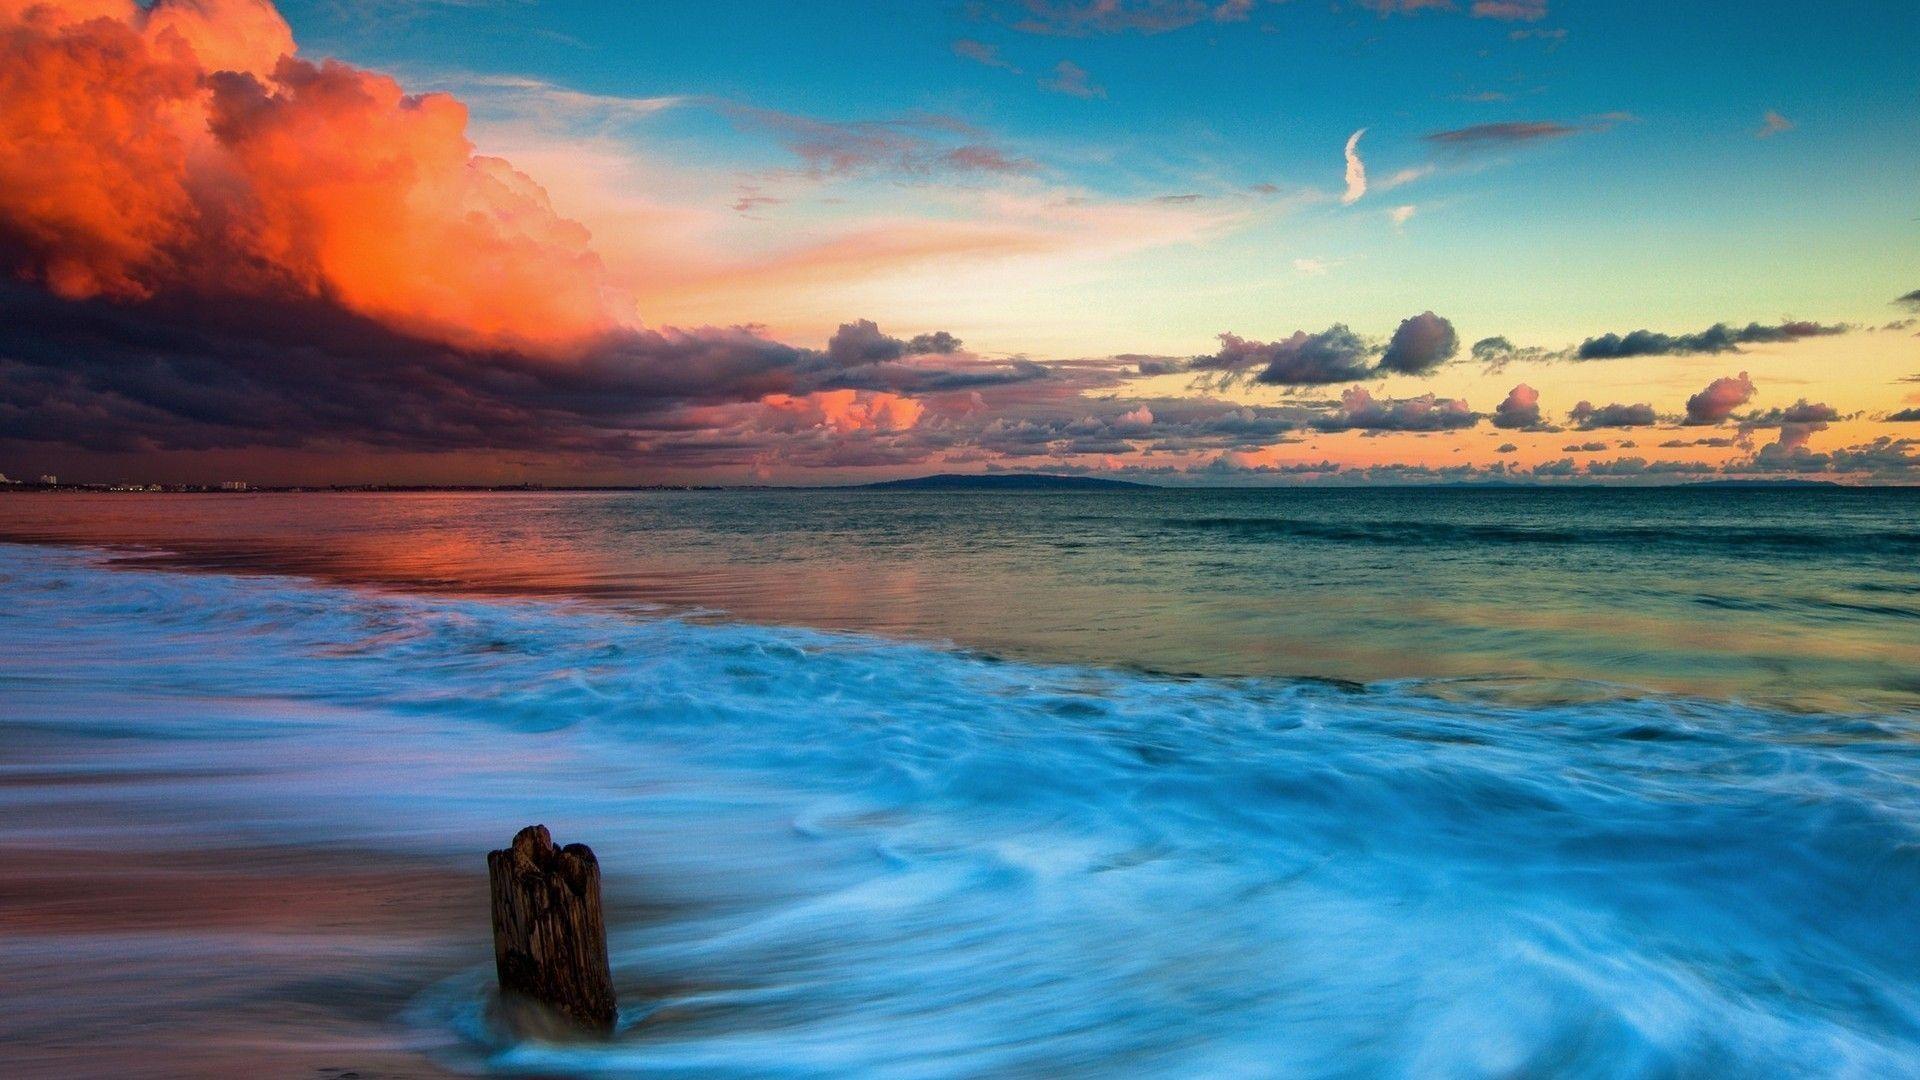 Los Angeles Wallpaper Iphone 6 Plus California Beach Wallpaper 183 ①